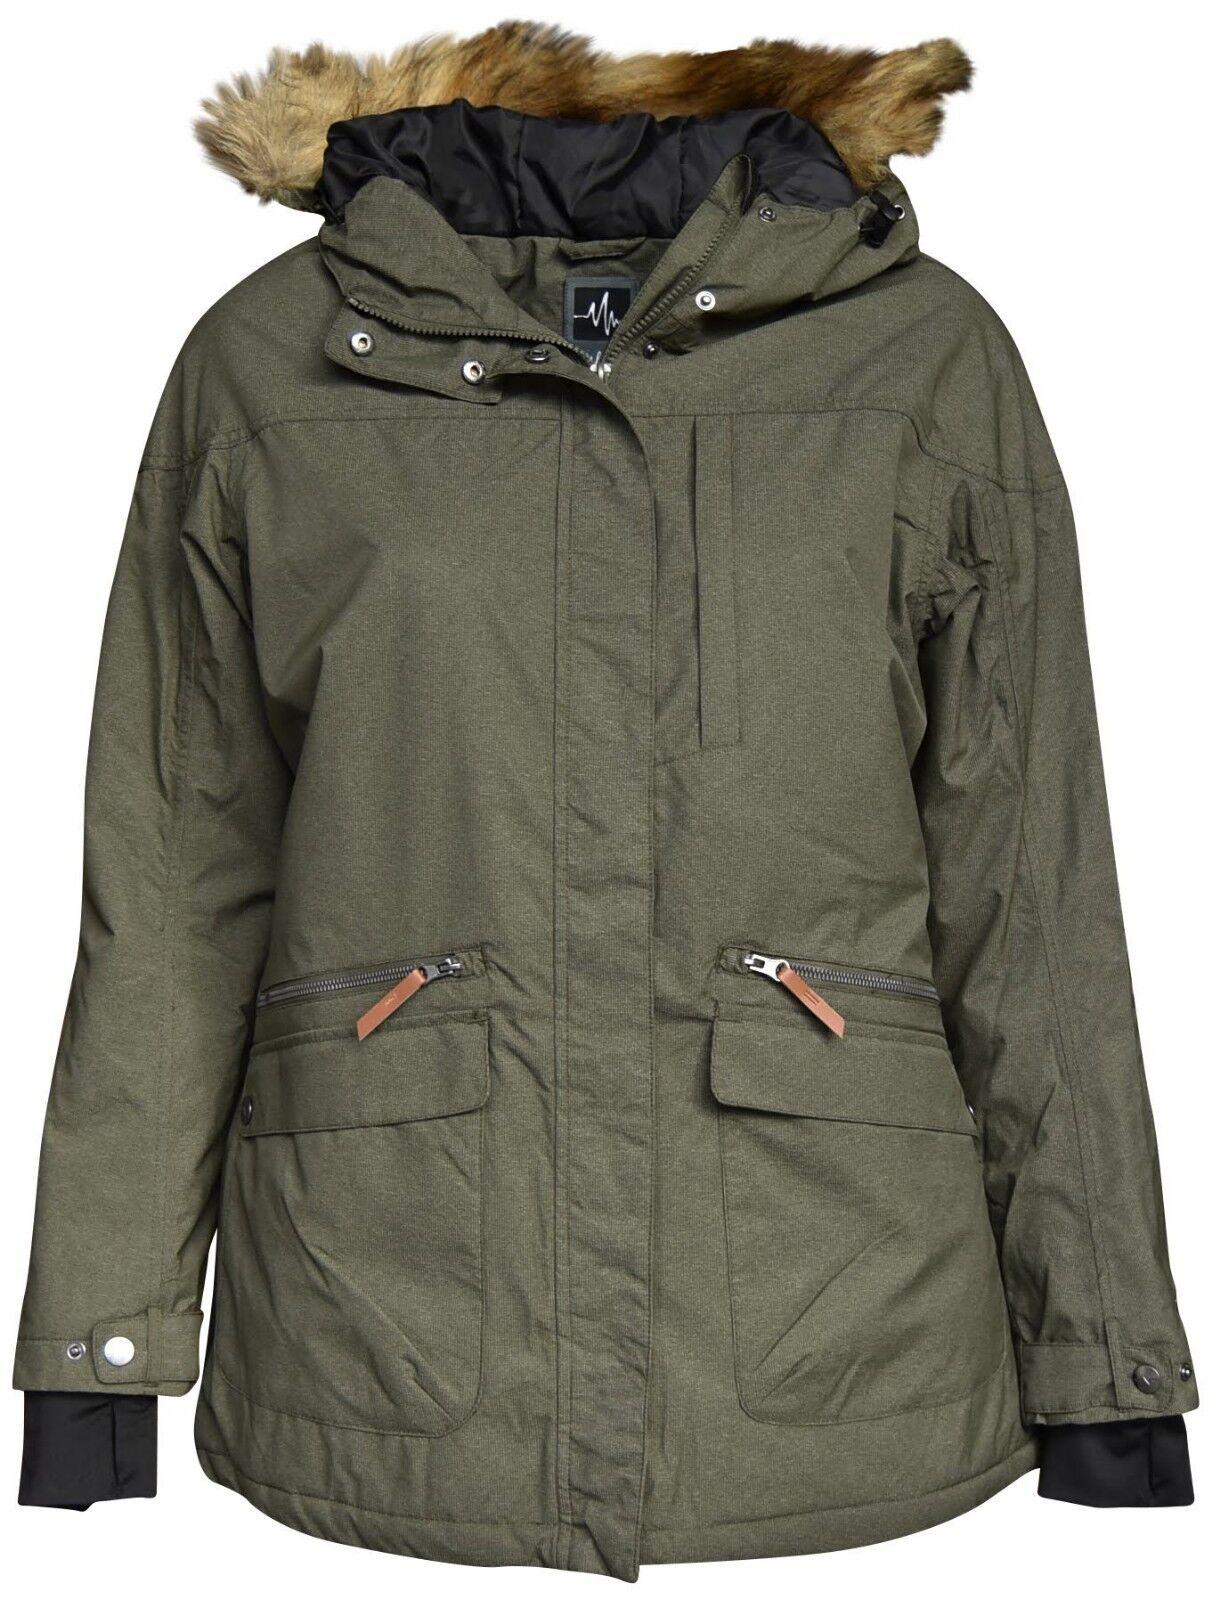 New Pulse Women's Plus Size 1X 2X 3X Insulated Parka 3 4 Societe Coat Olive  199